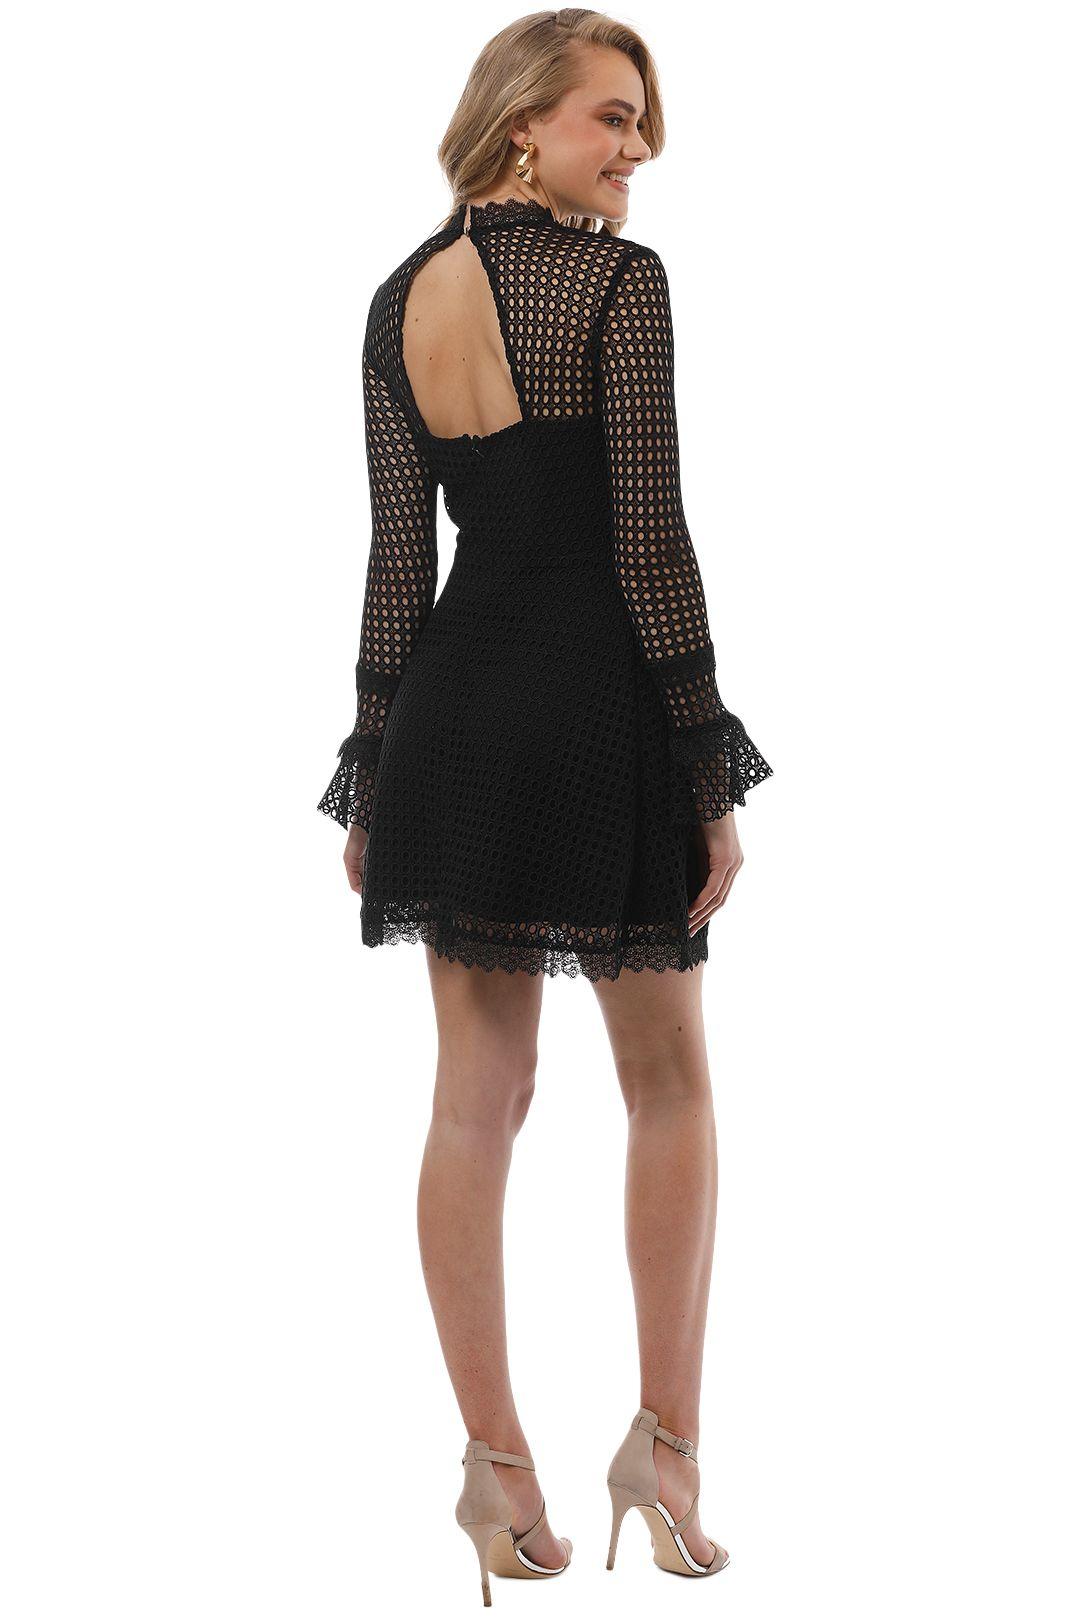 Pasduchas - Reign Dress - Black - Back